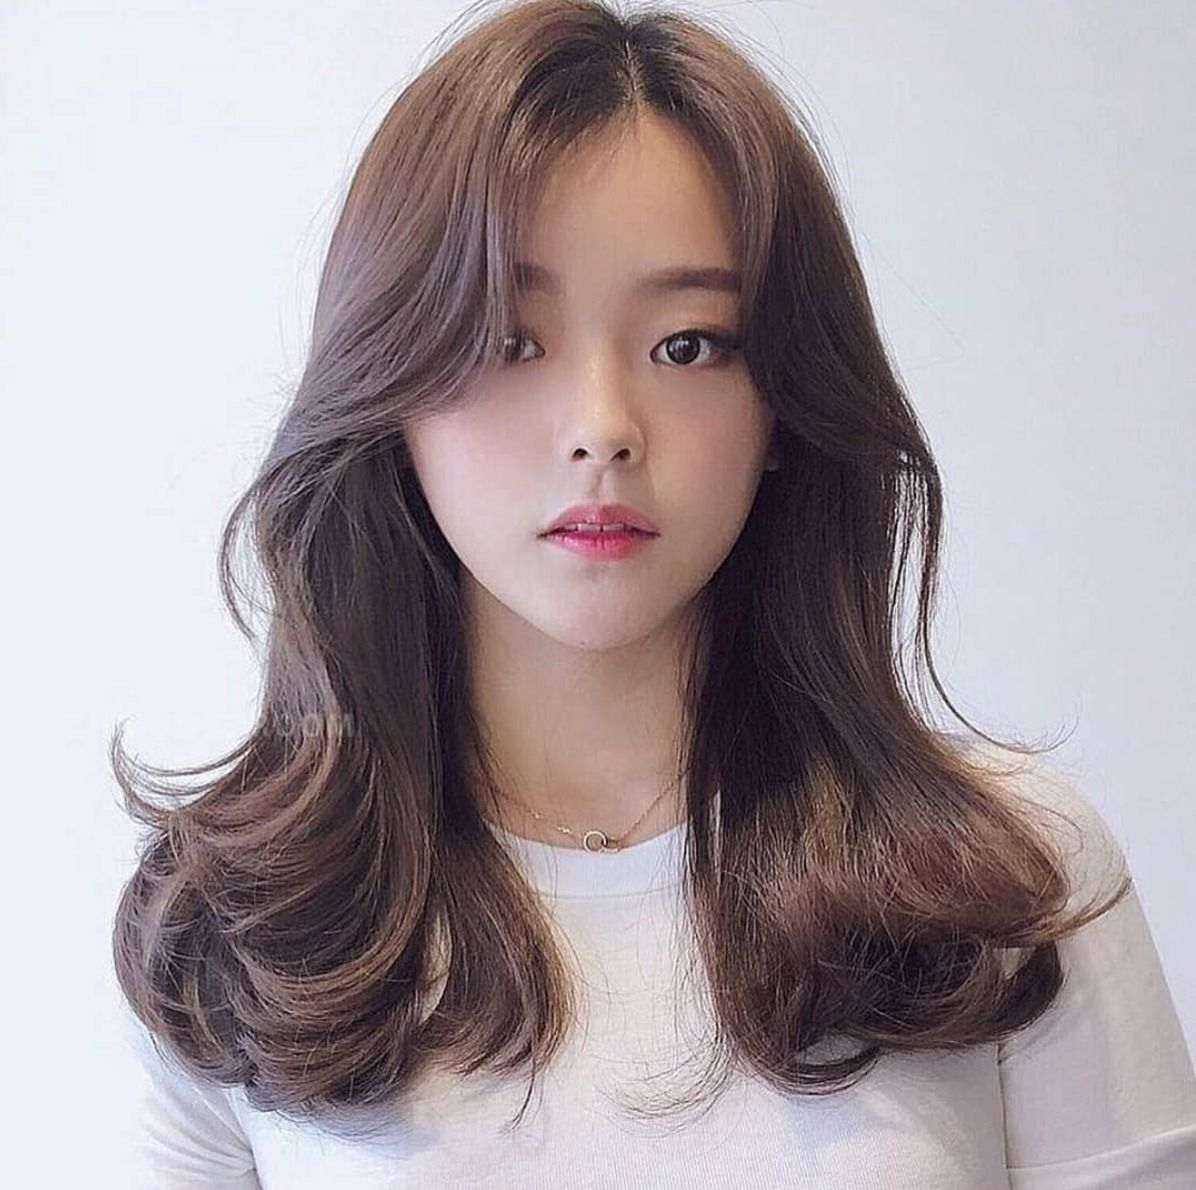 The Hottest Long Side Korean Bangs In 2019 Top Beauty Lifestyles Korean Long Hair Medium Hair Styles Medium Thin Hair